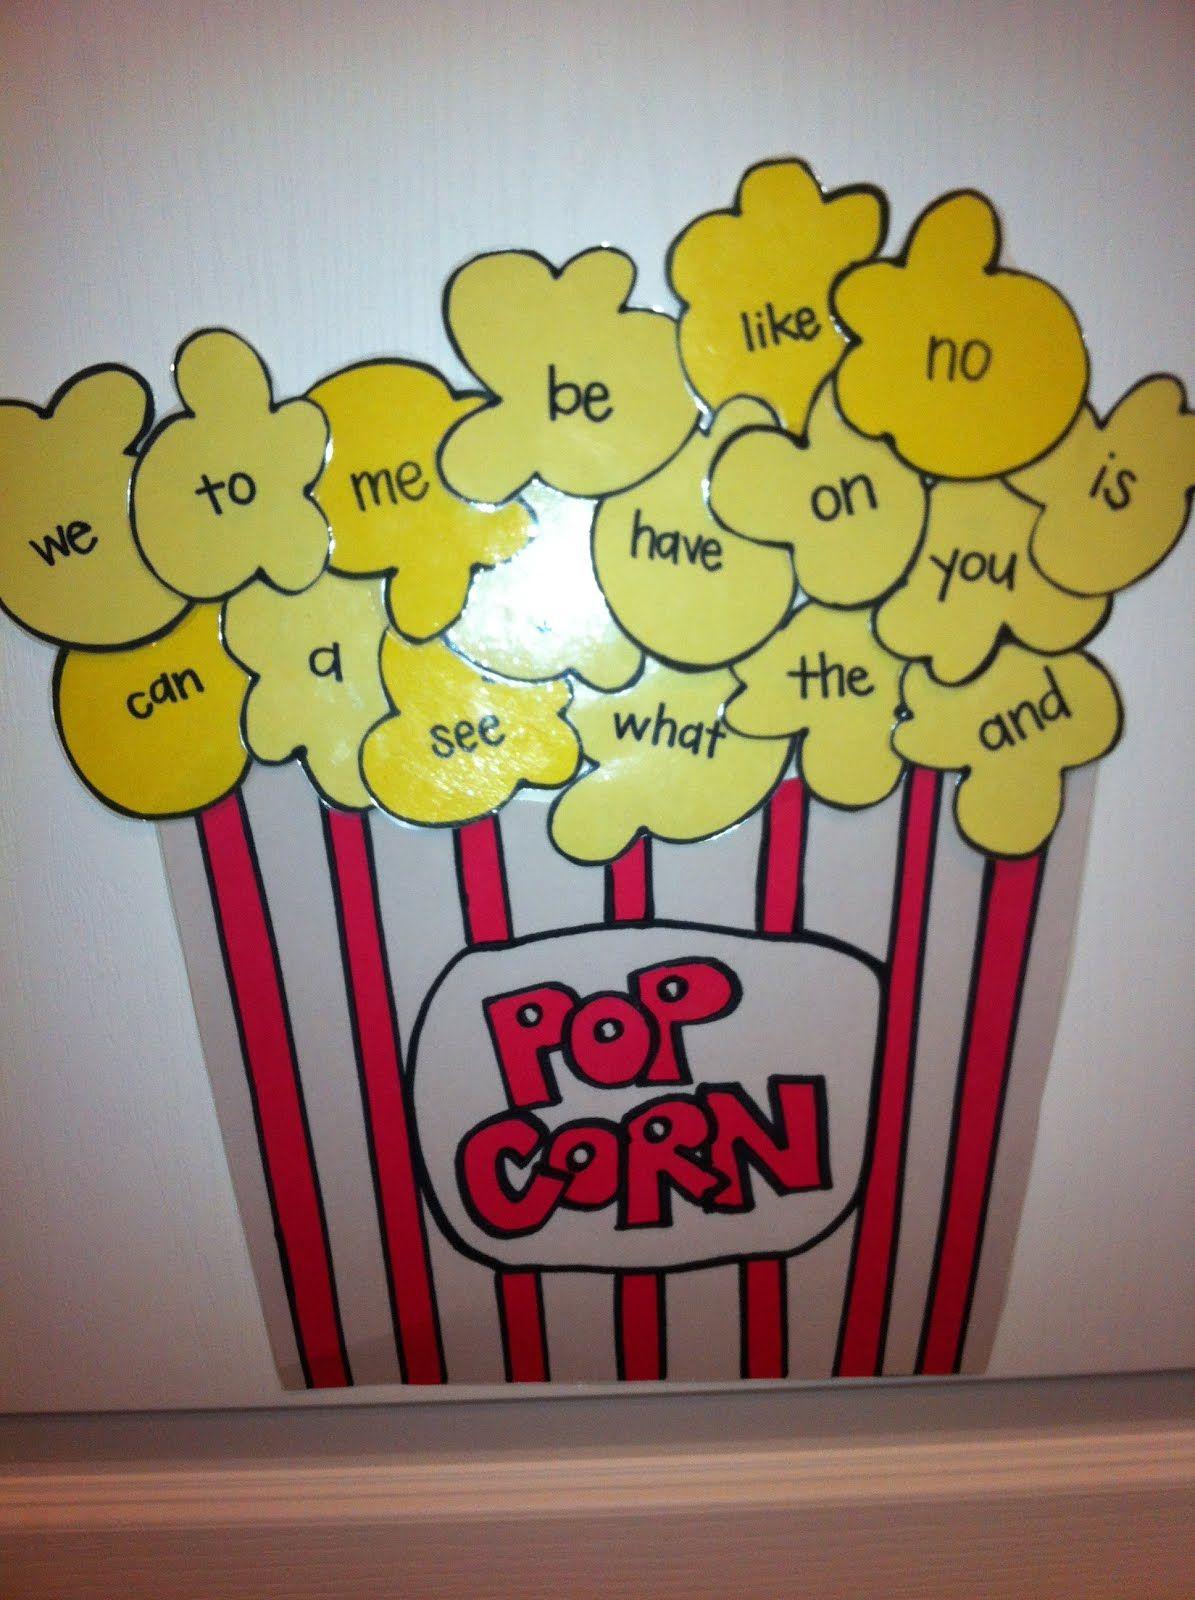 Popcorn Seight Words 1 195 1 600 Pixels